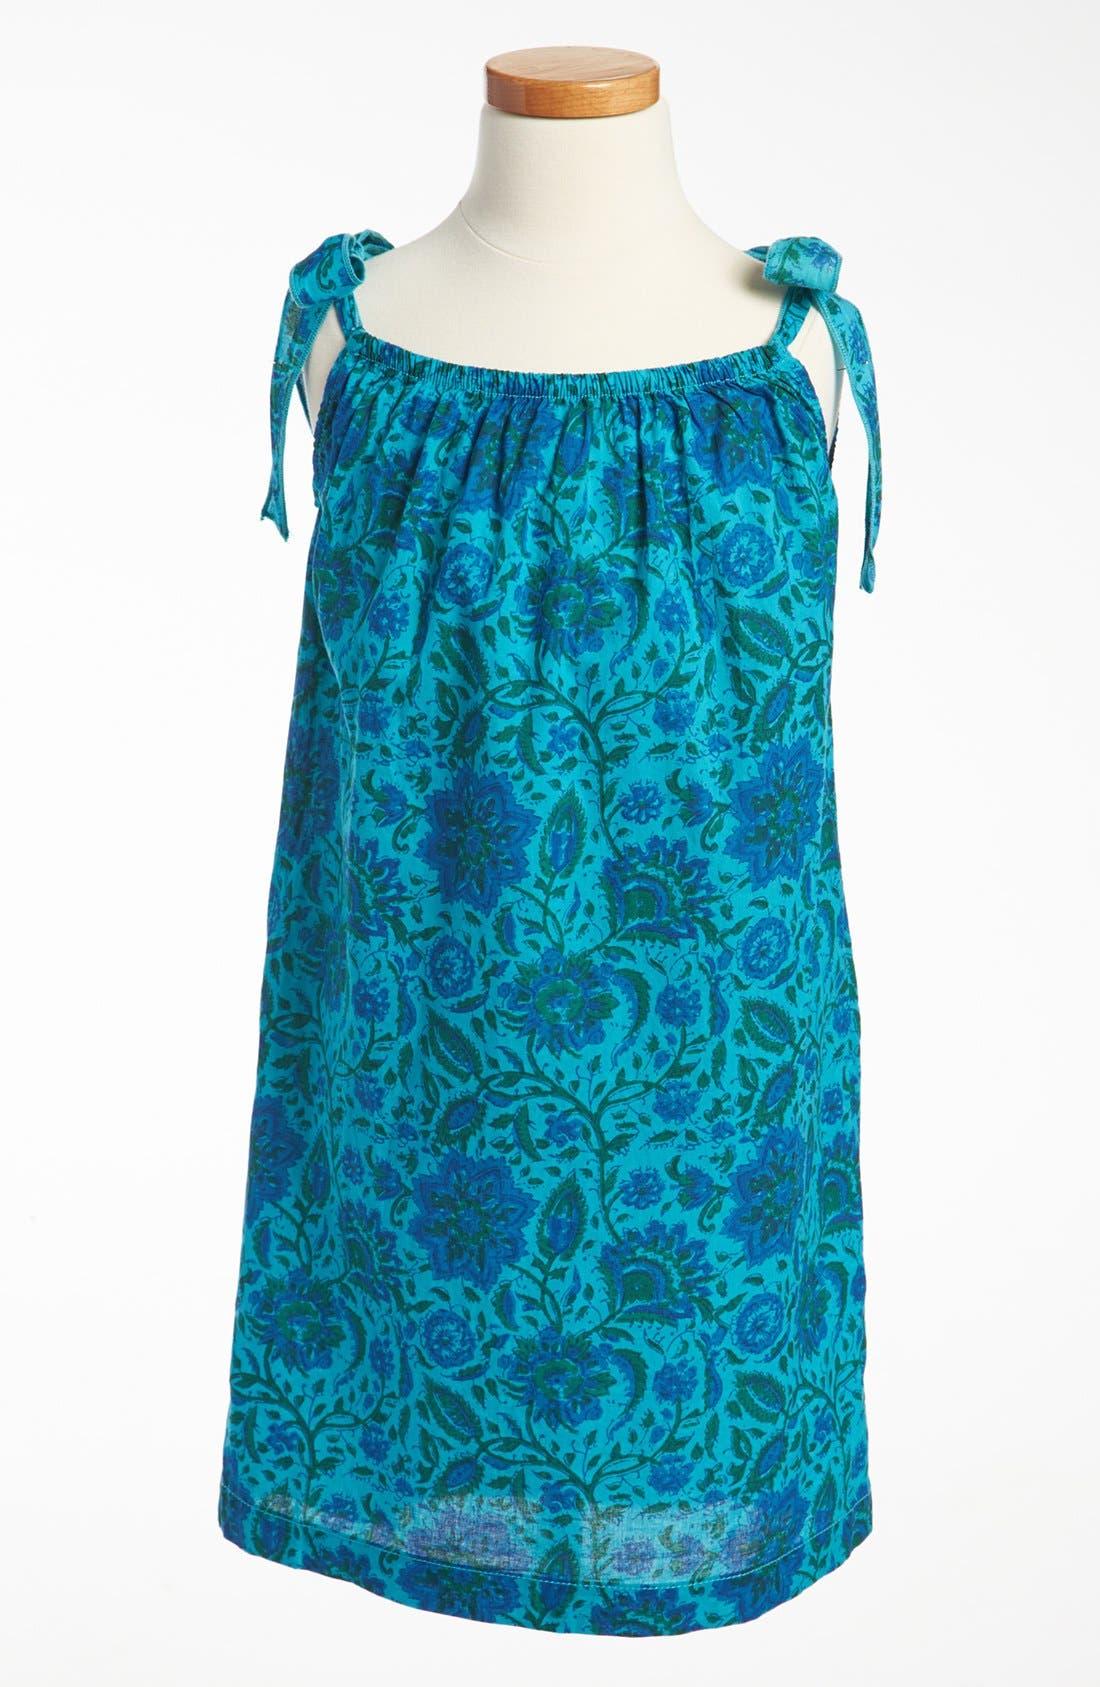 Alternate Image 1 Selected - Peek 'Gigi' Dress (Big Girls)